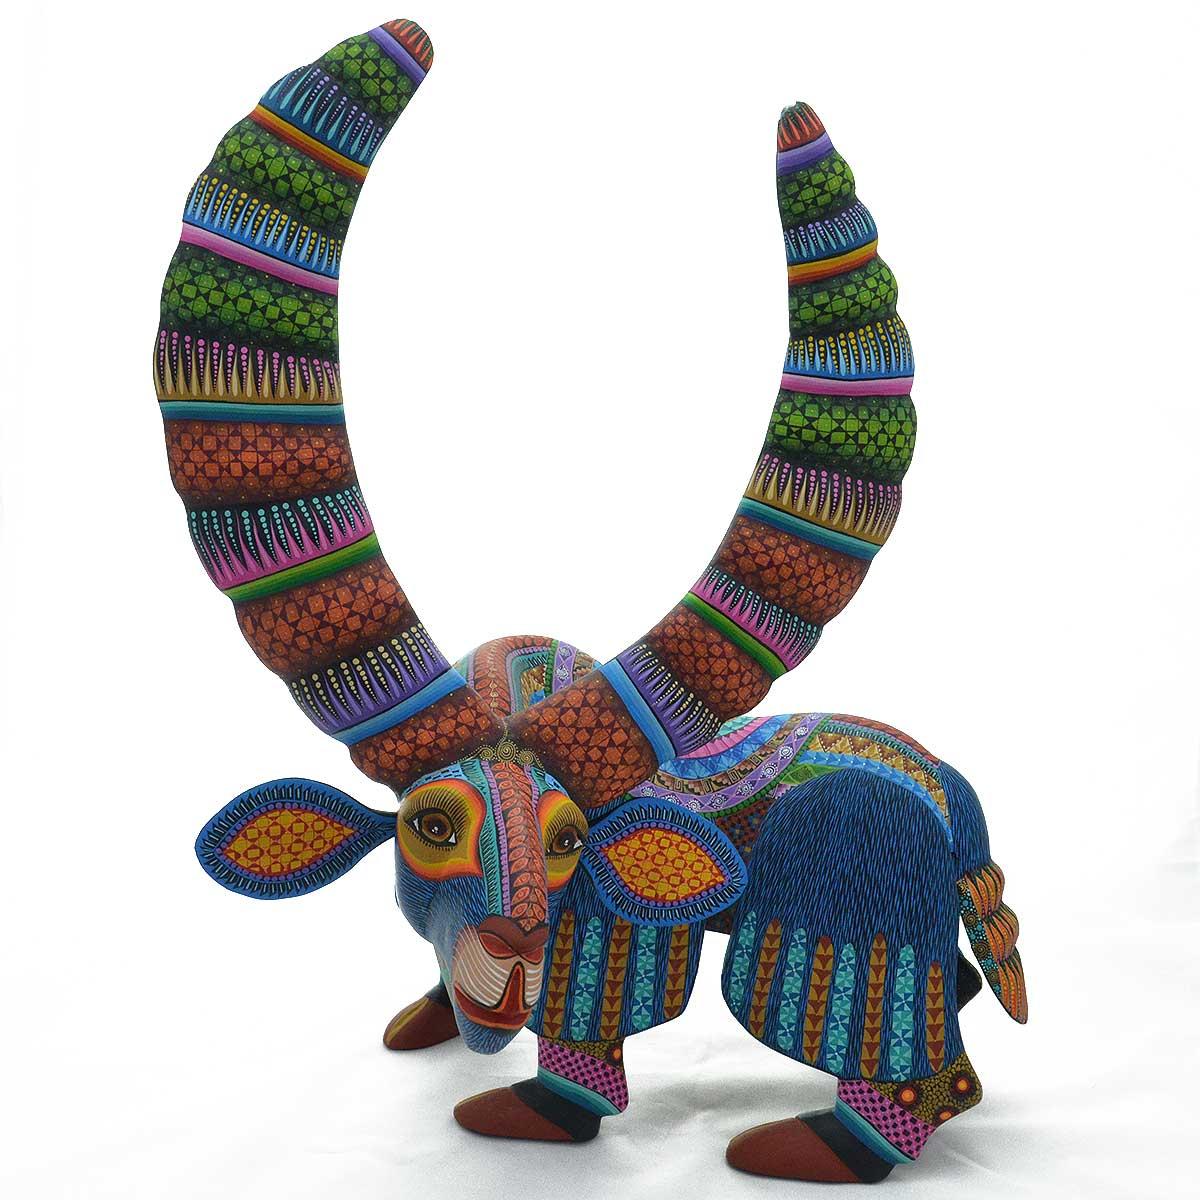 Ivan Fuentes & Mayte Calvo: African Antelope